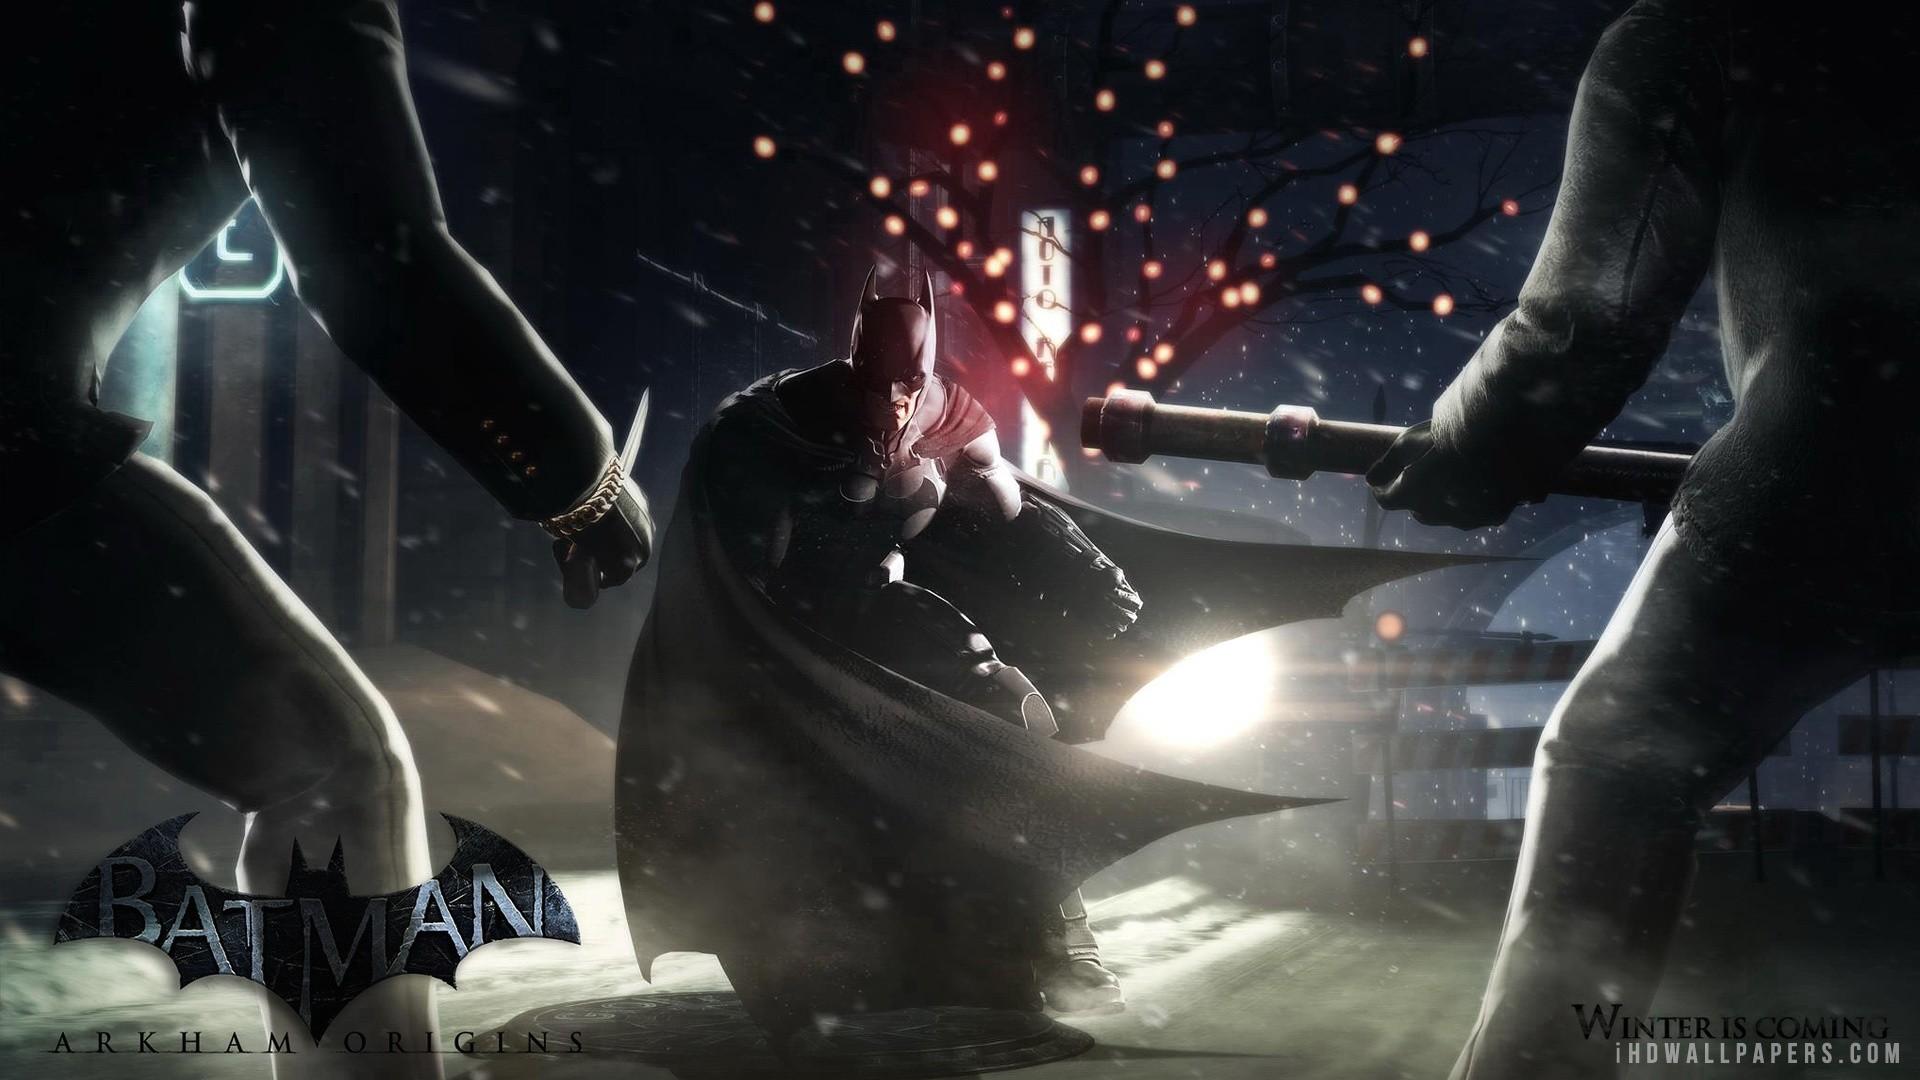 Batman Arkham Origins Video Game Wallpapers HD Wallpapers